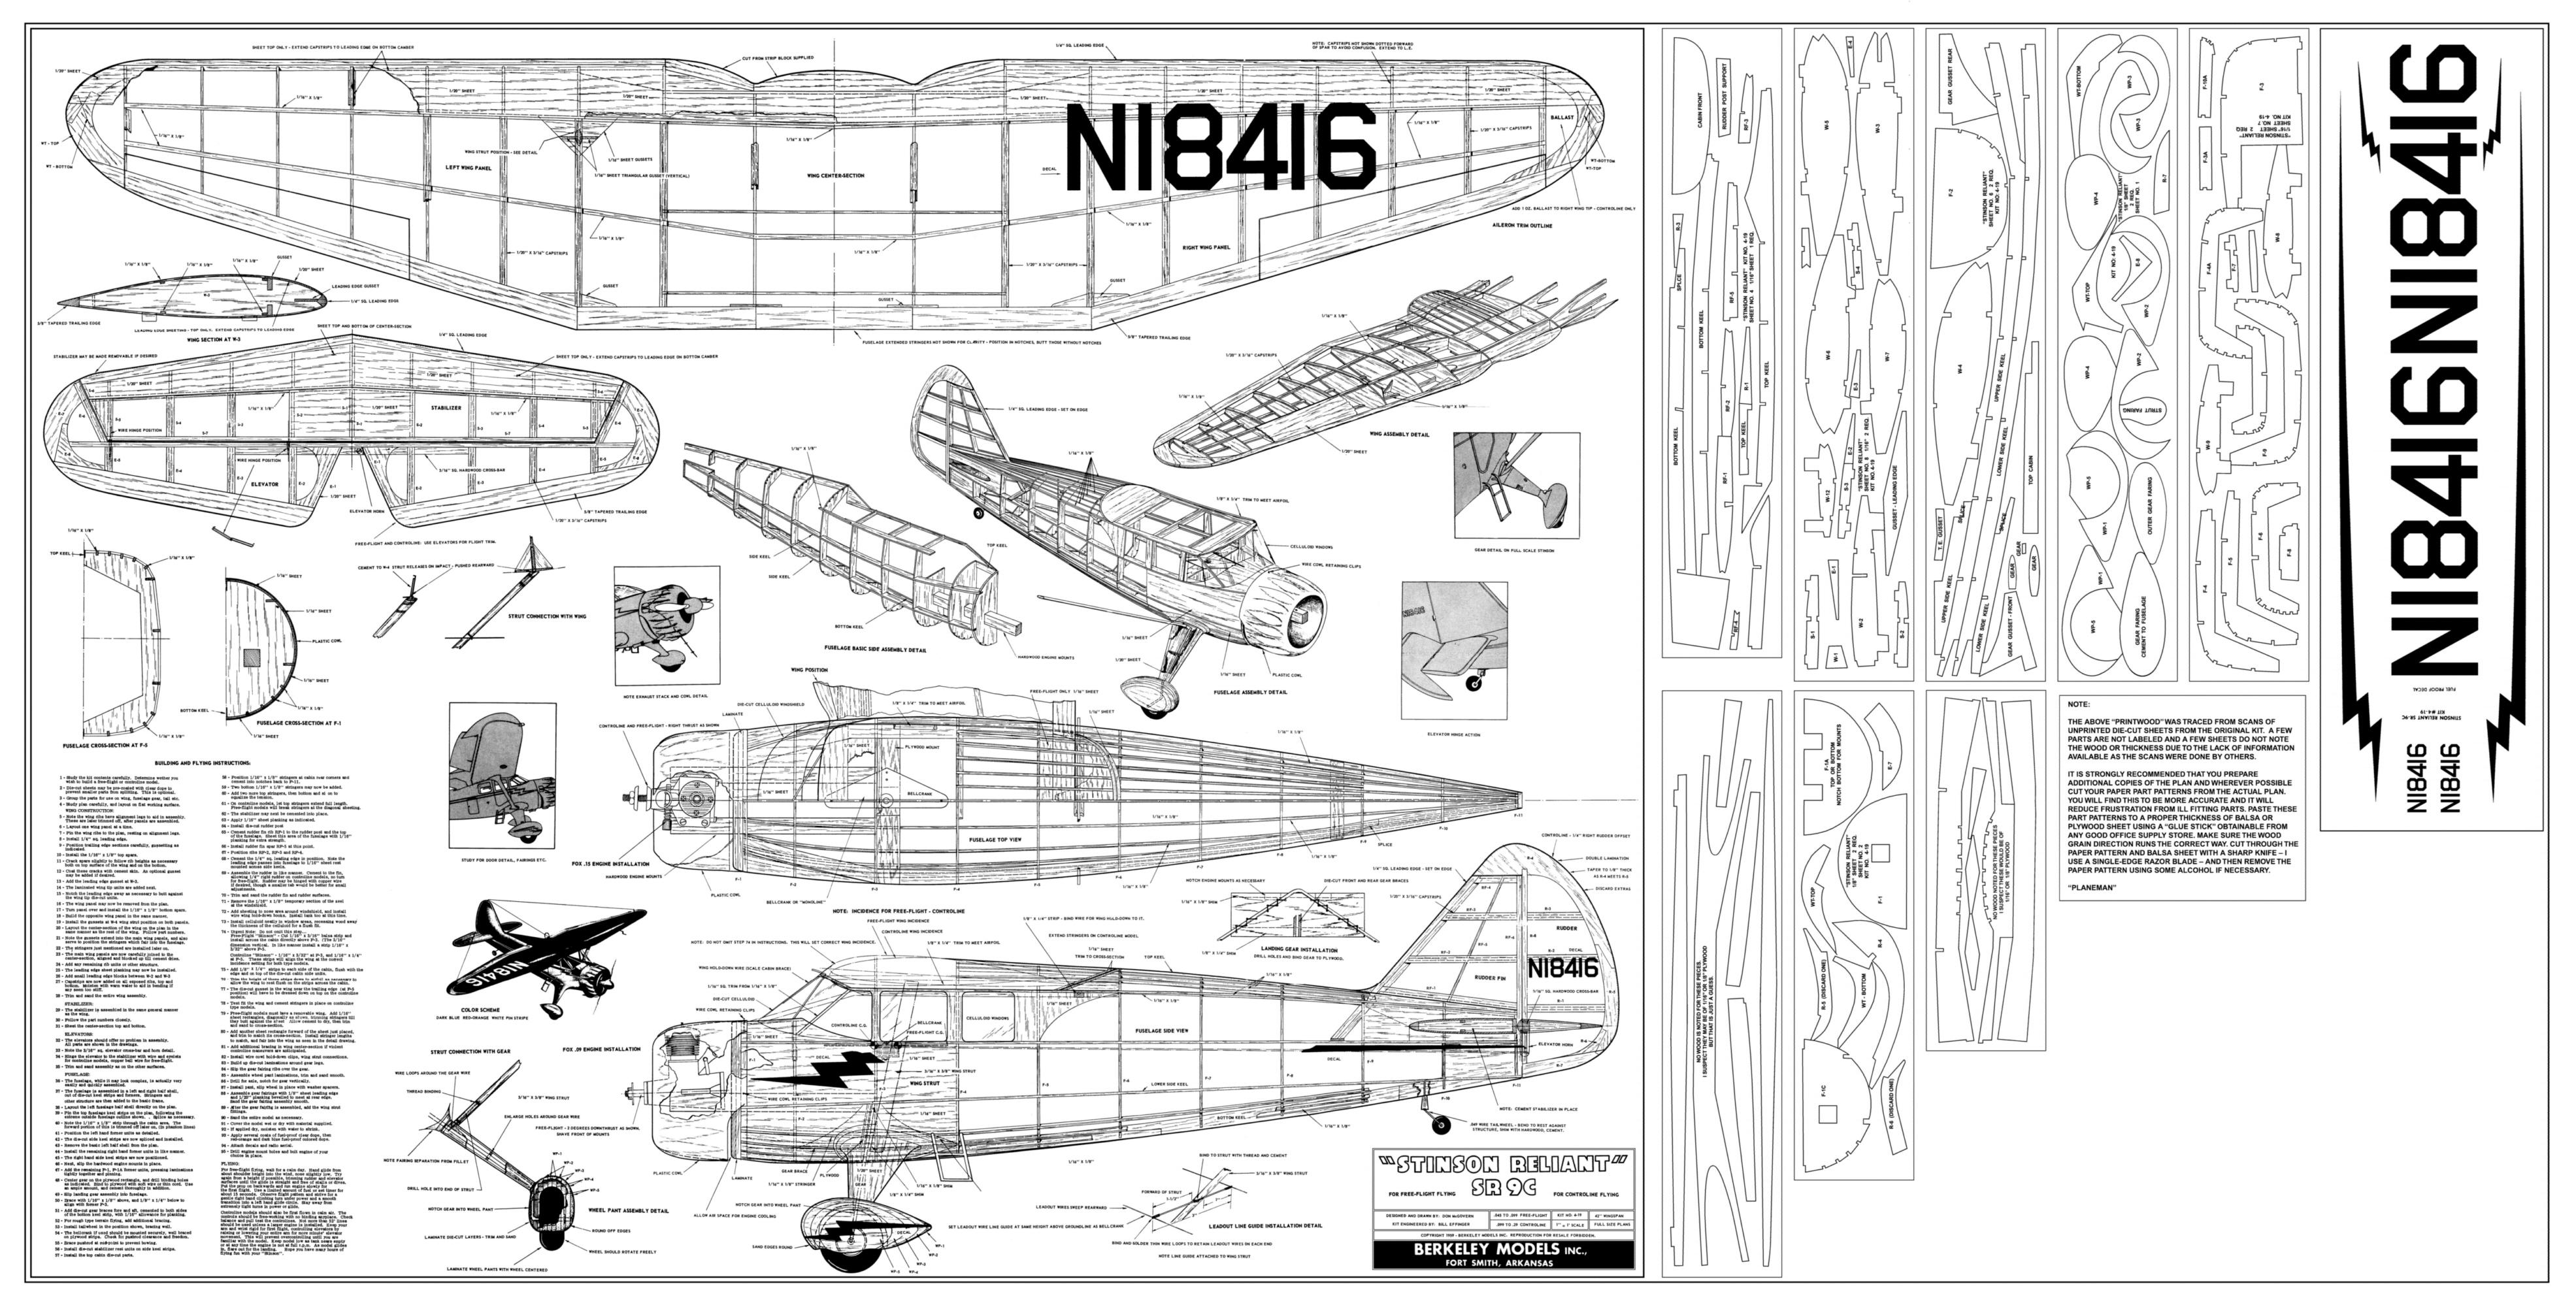 Pln Stinson Reilant Alebo Cessna C37 Airmaster Modelrske Wiring Diagram Bydlisko